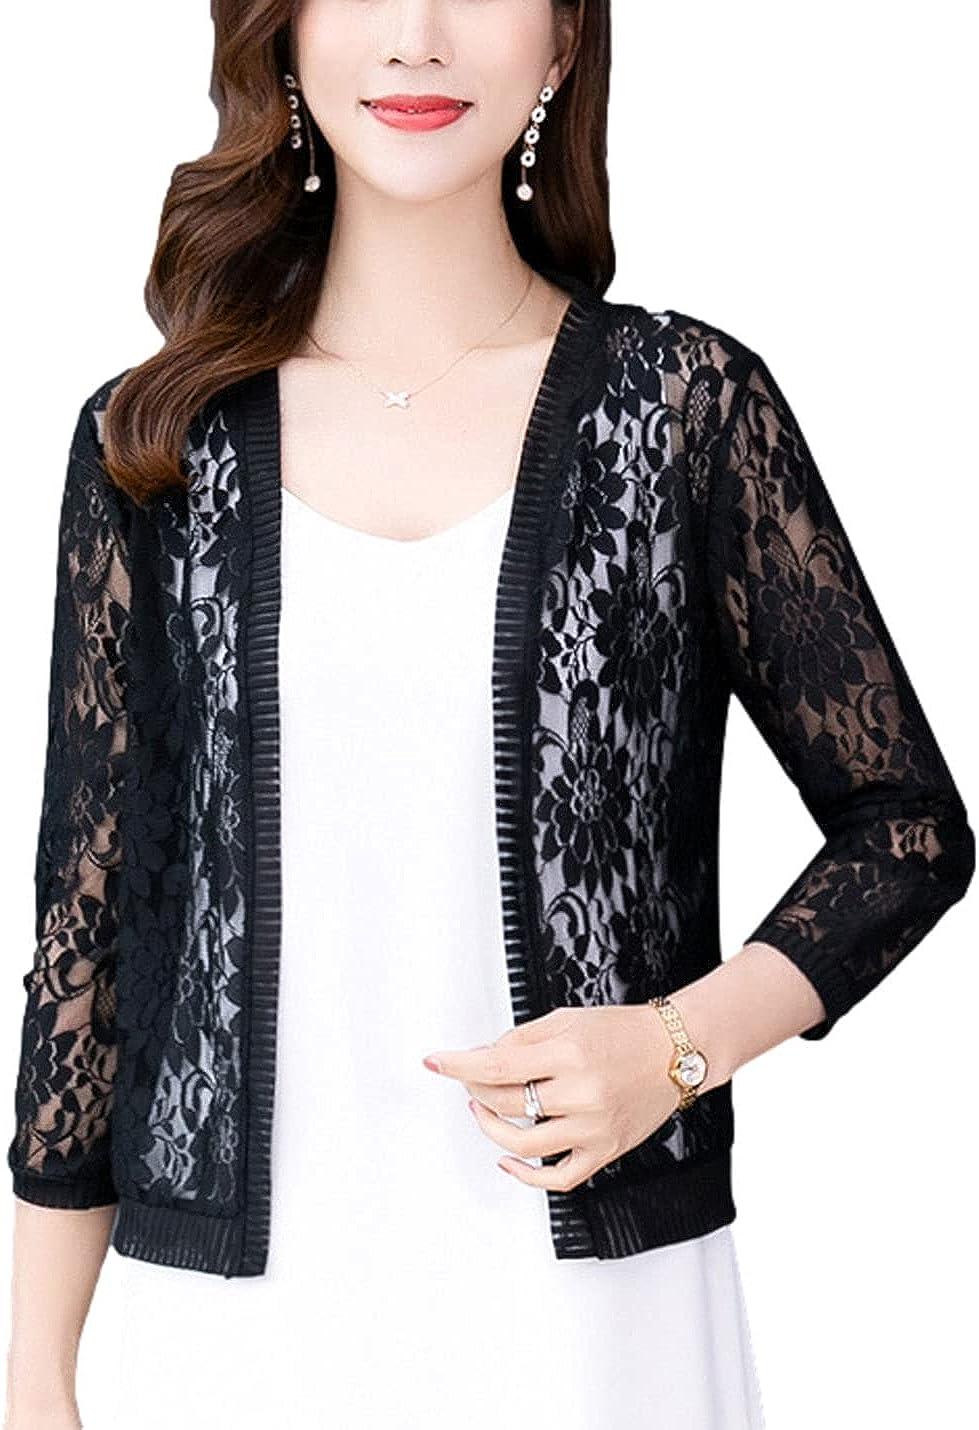 FindThy Women's Floral Lace Shrug Cardigan 3/4 Sleeve Crochet Bolero Jacket